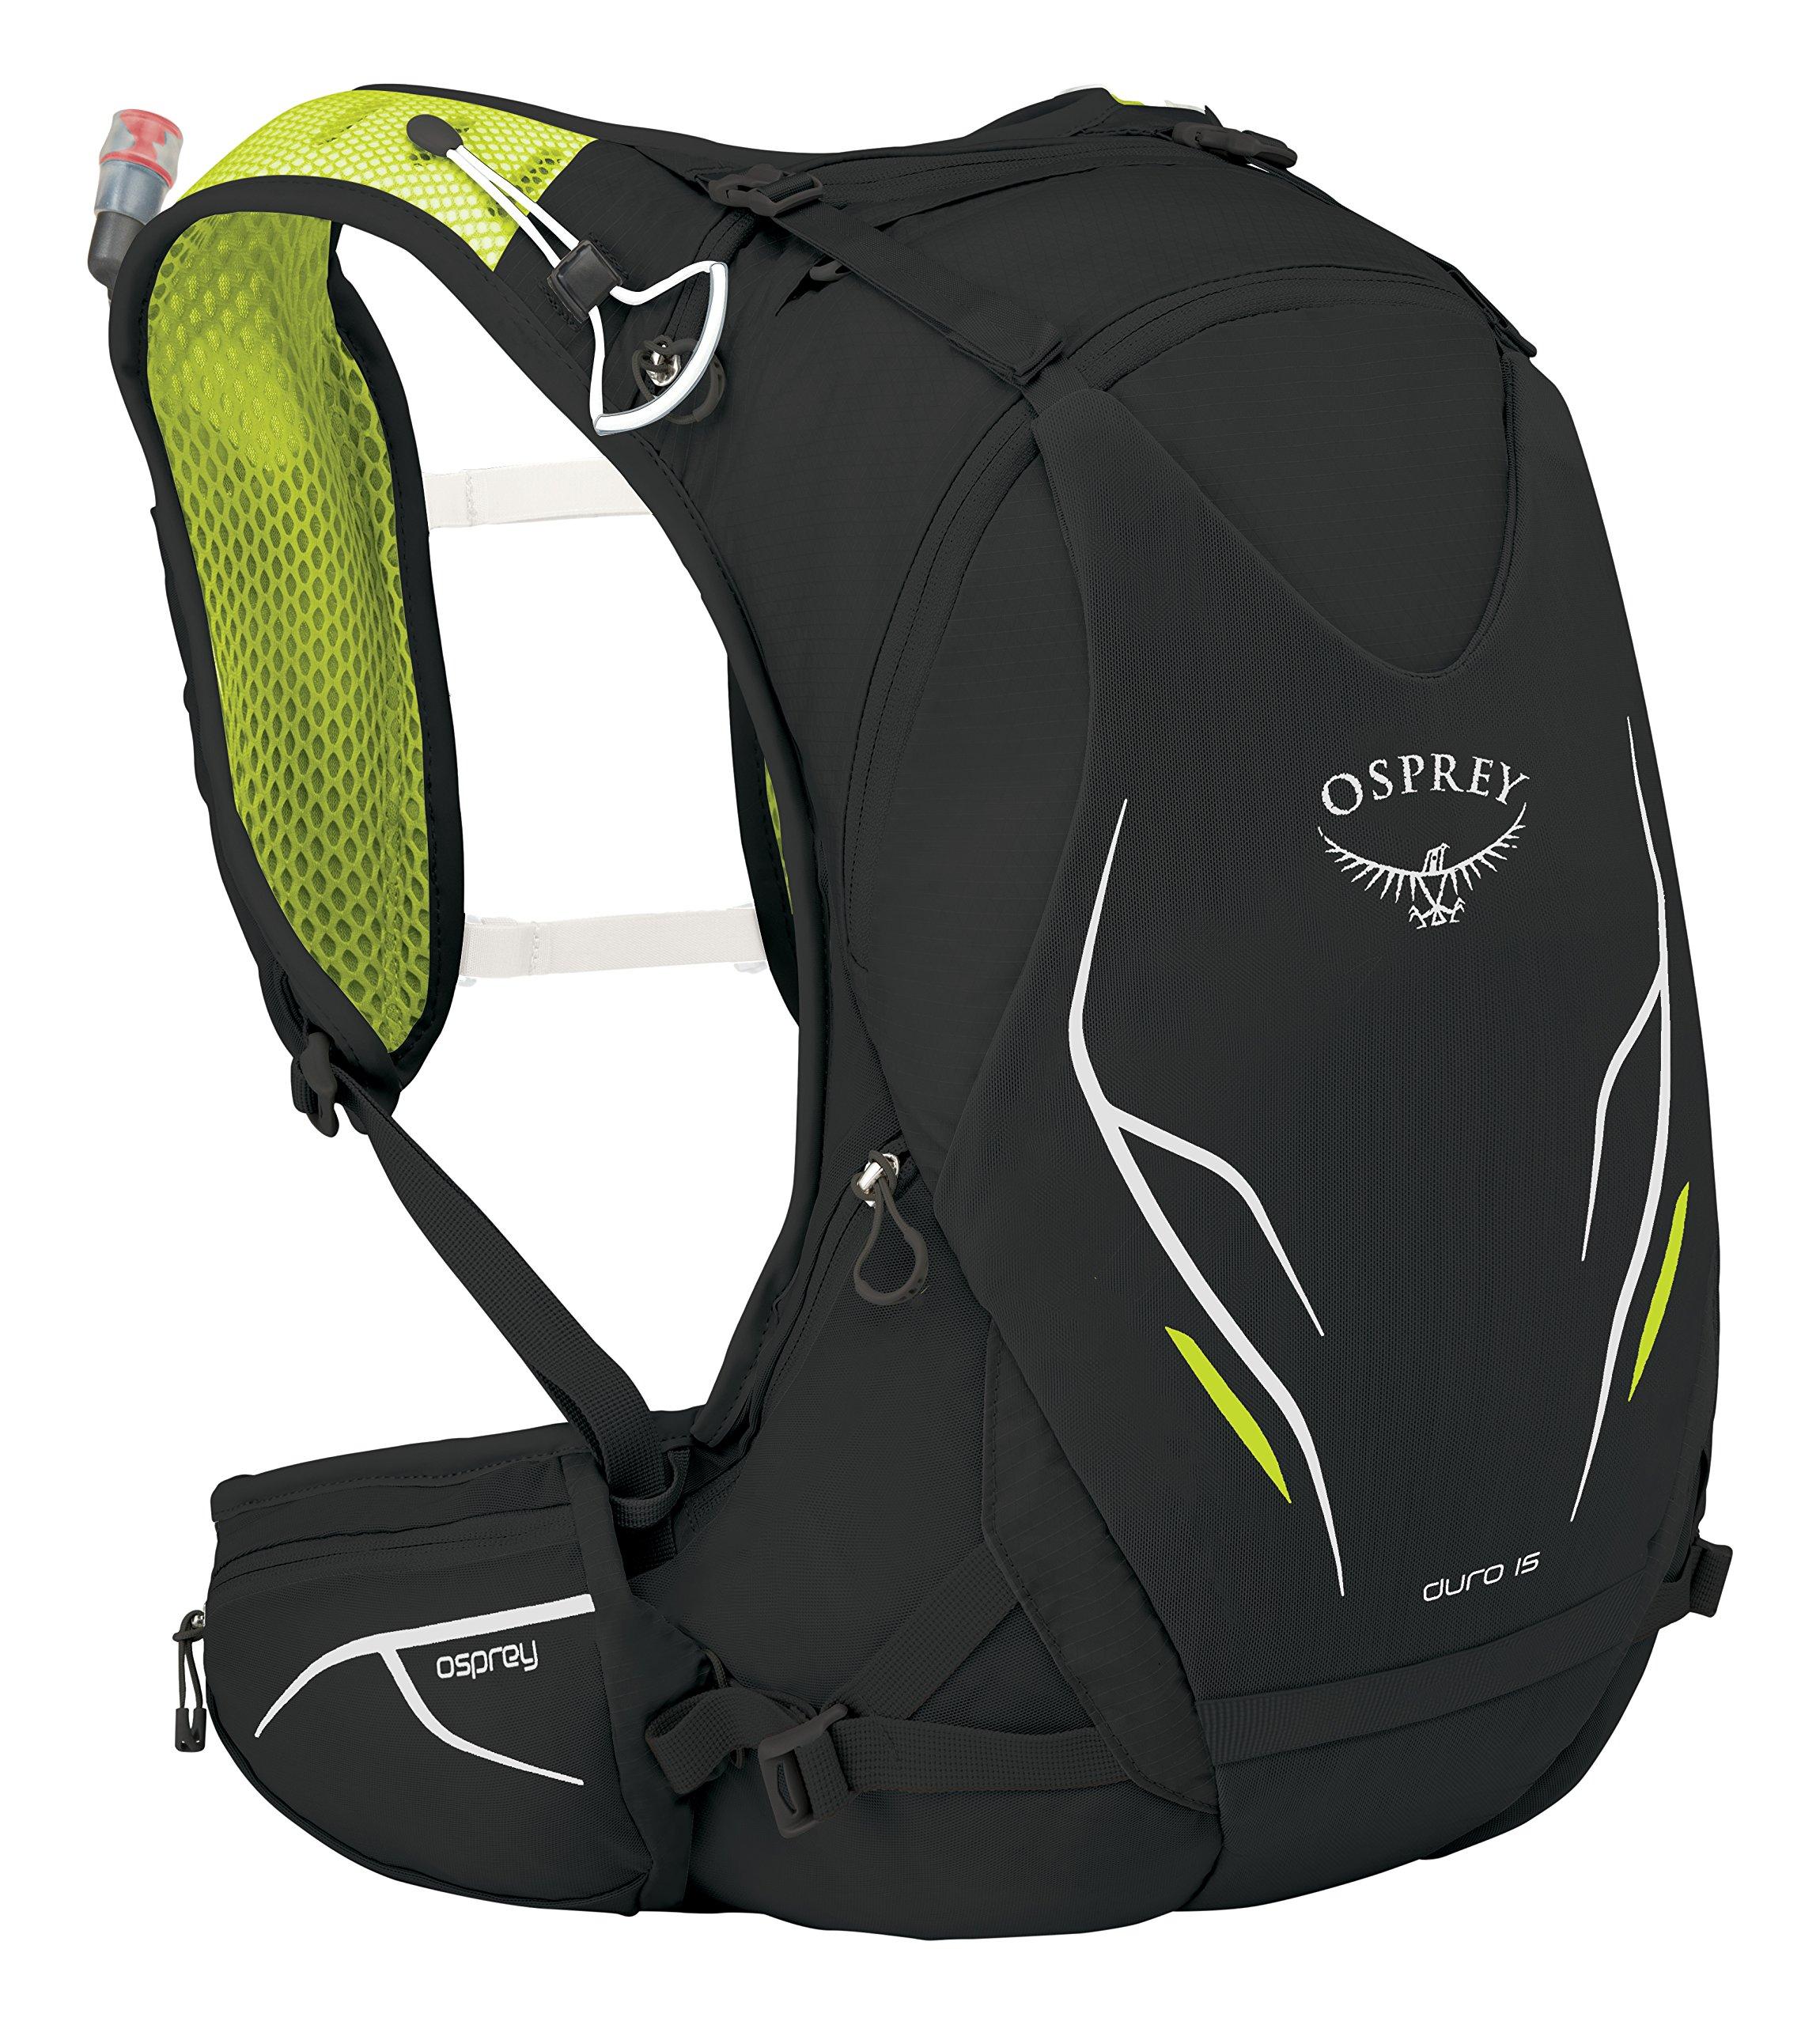 Osprey Packs Duro 15 Hydration Pack, Electric Black, M/l, Medium/Large